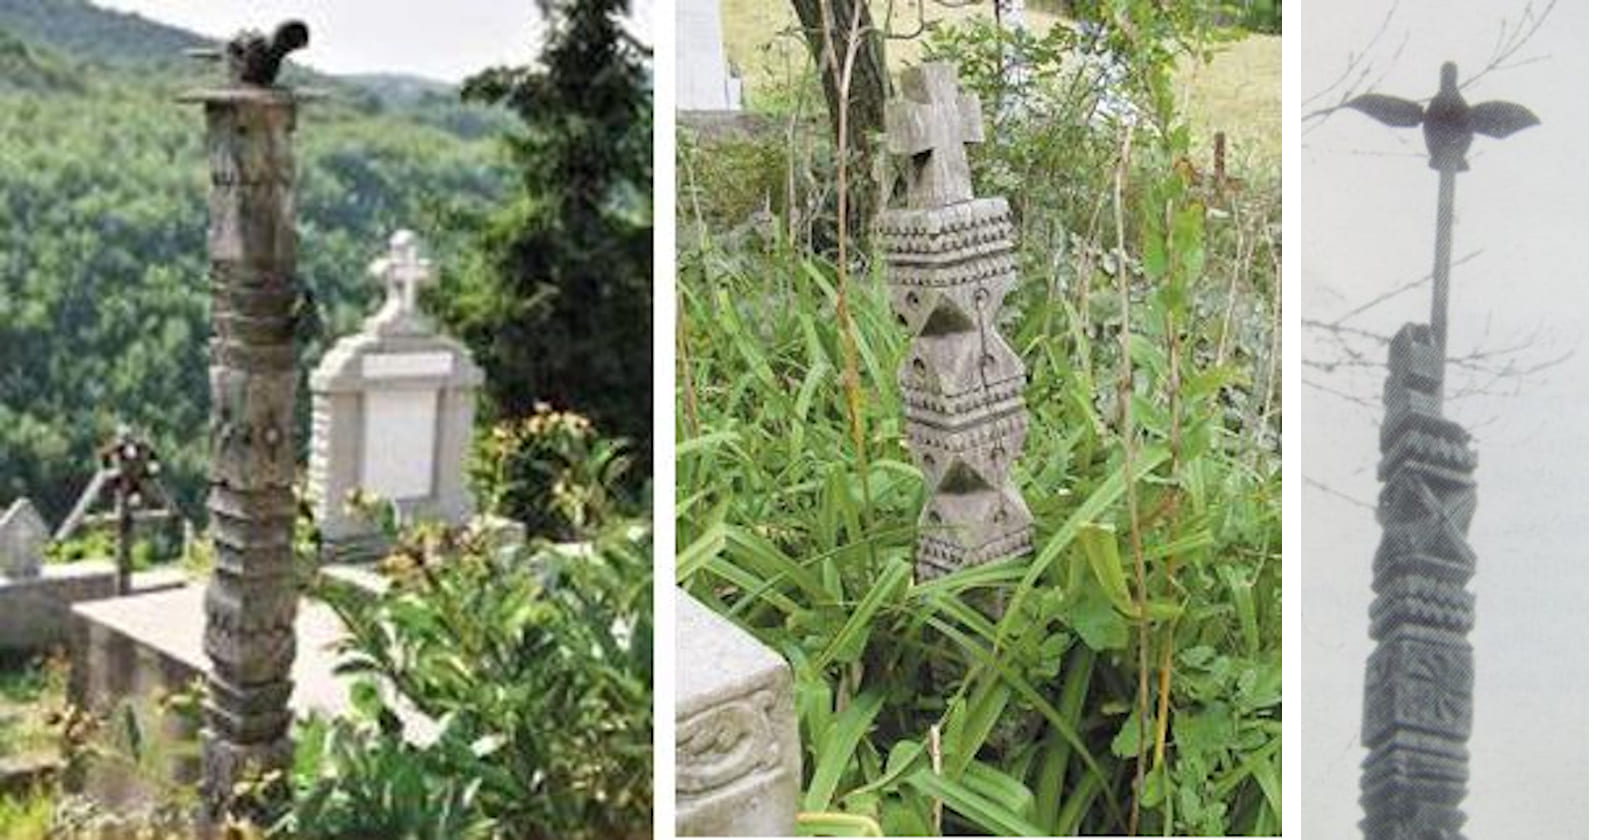 Stâlpul funerar - Axa Lumii - Arborele Vieții